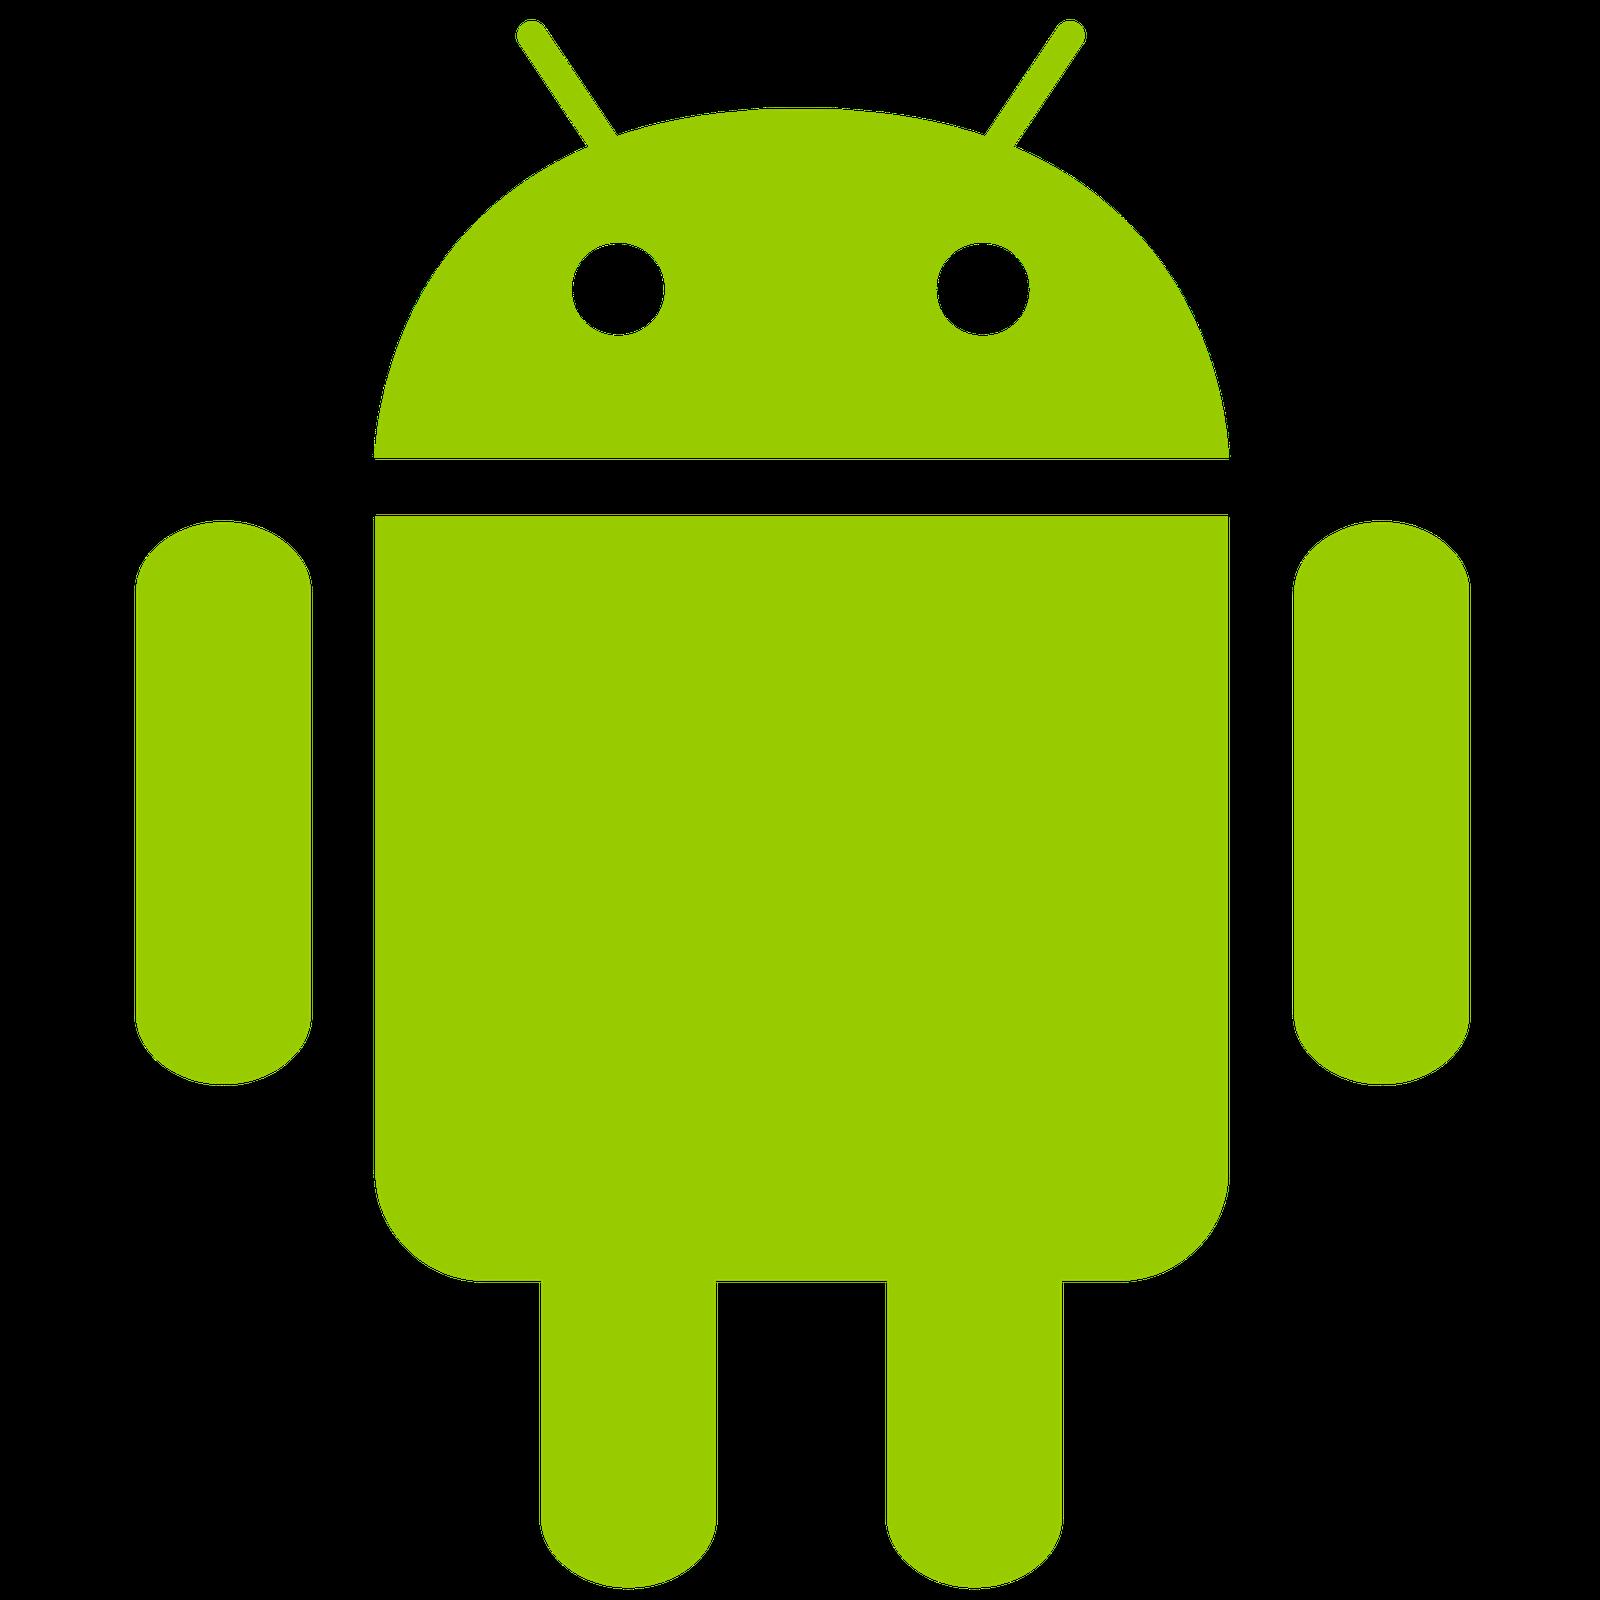 Track করুন বিরক্তিকর কলারের নাম্বার…বা যে করো নাম্বার… With UpDate New Apps From Gogle Play…..এবার Track হবেই….